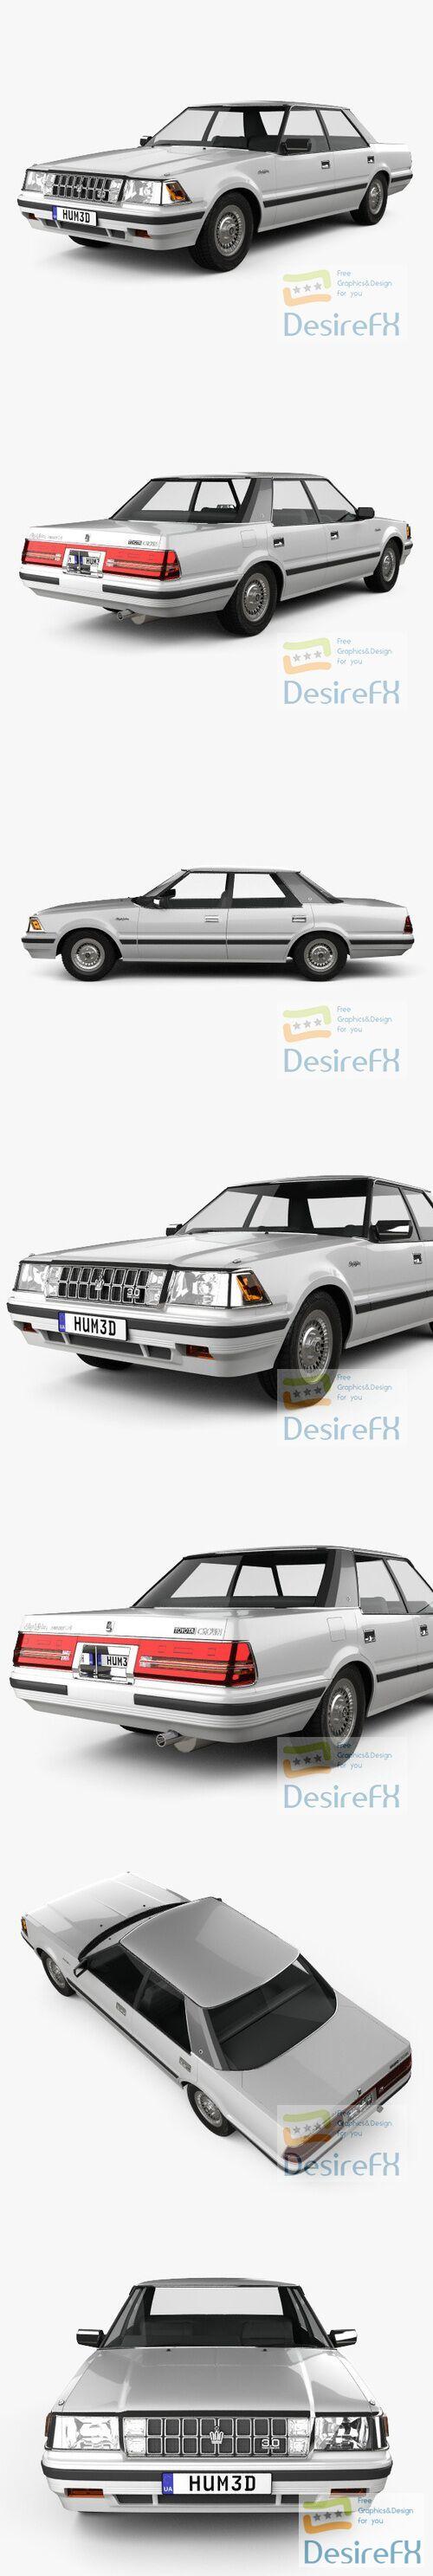 Toyota Crown Royal Saloon 1983 3D Model